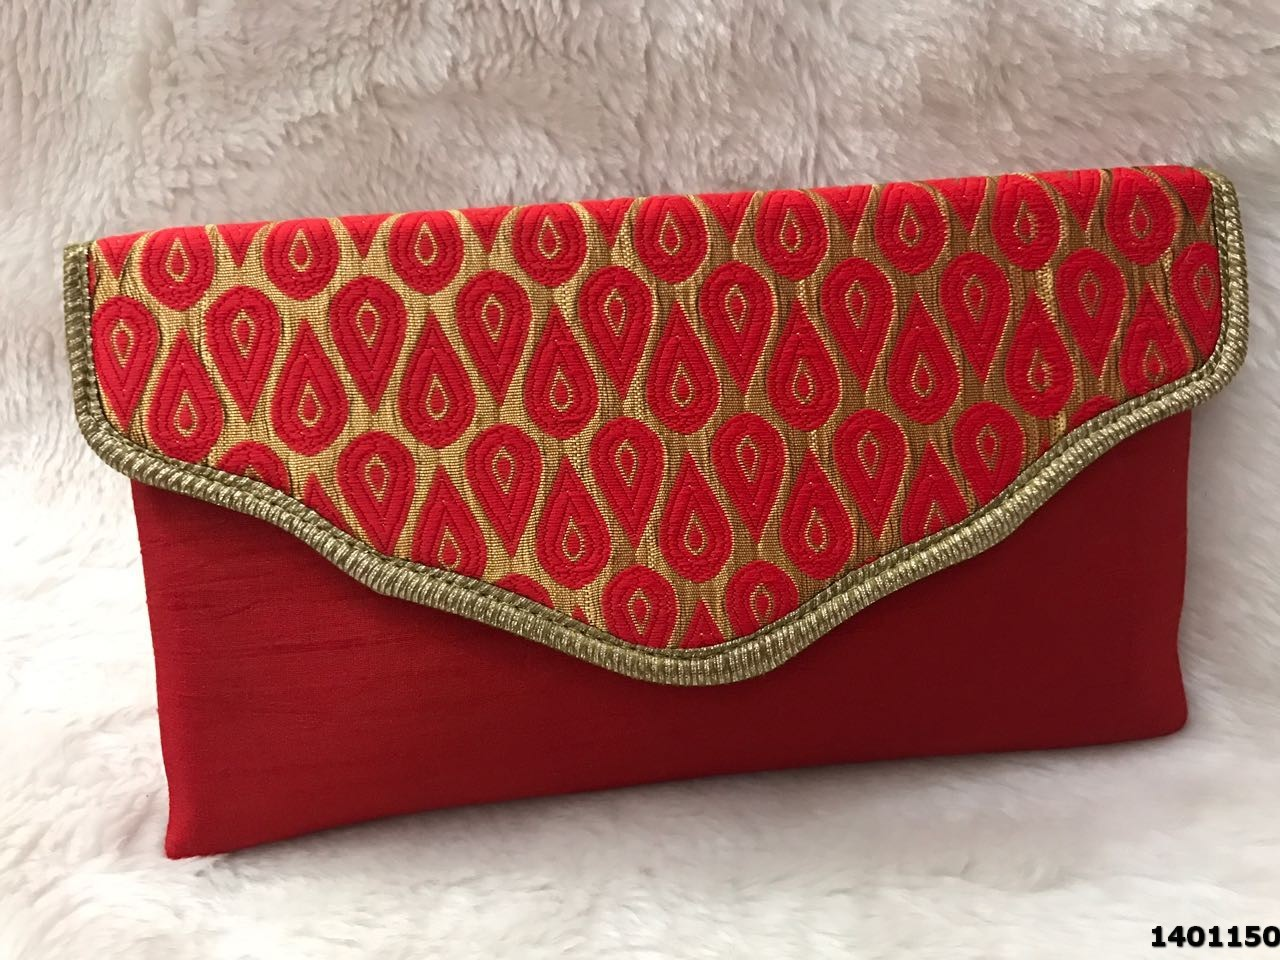 Amazing Stylish Clutch Bag